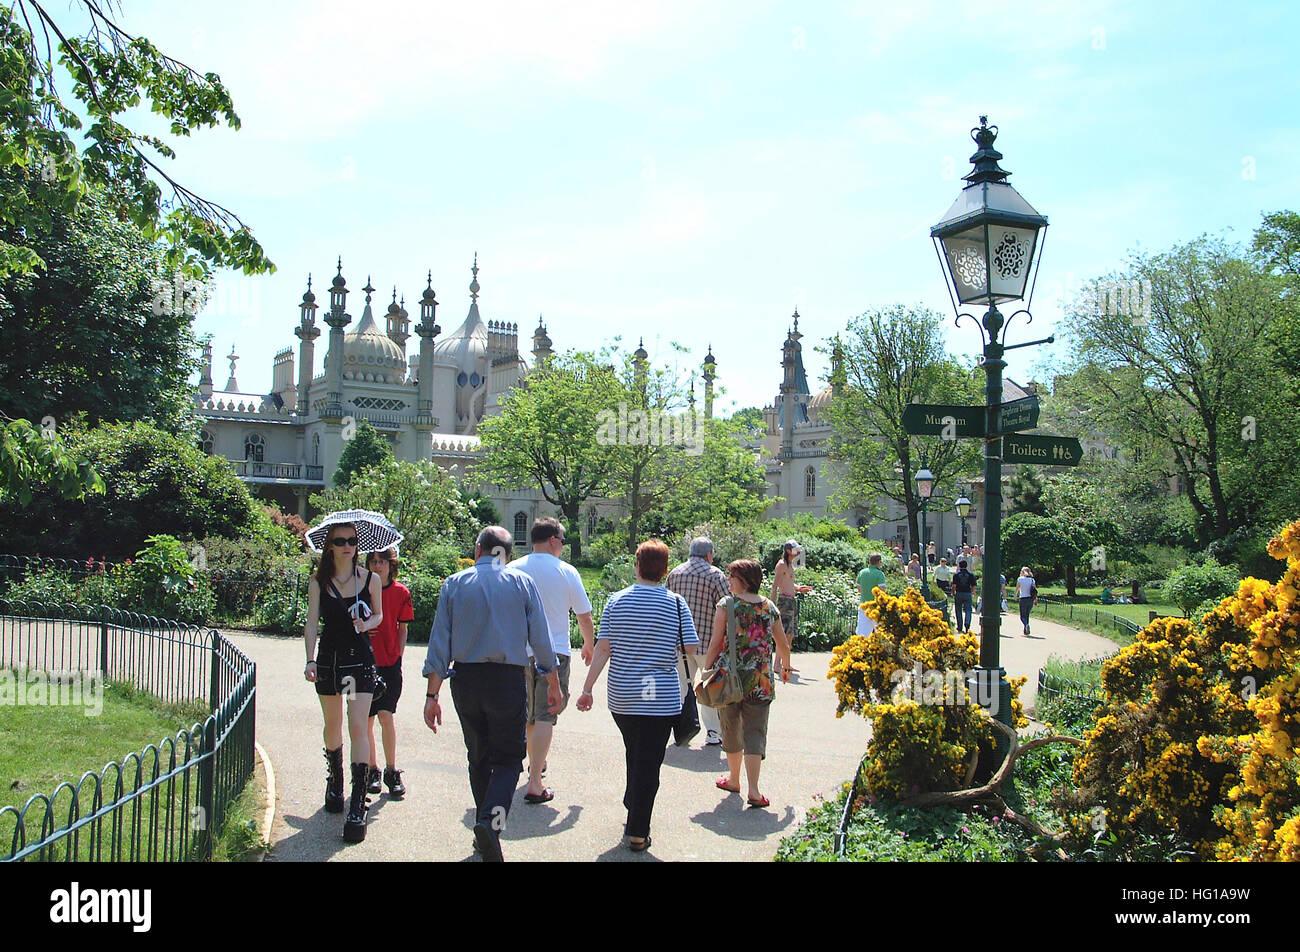 People enjoying the parks and gardens around Brighton Royal Pavilion. - Stock Image